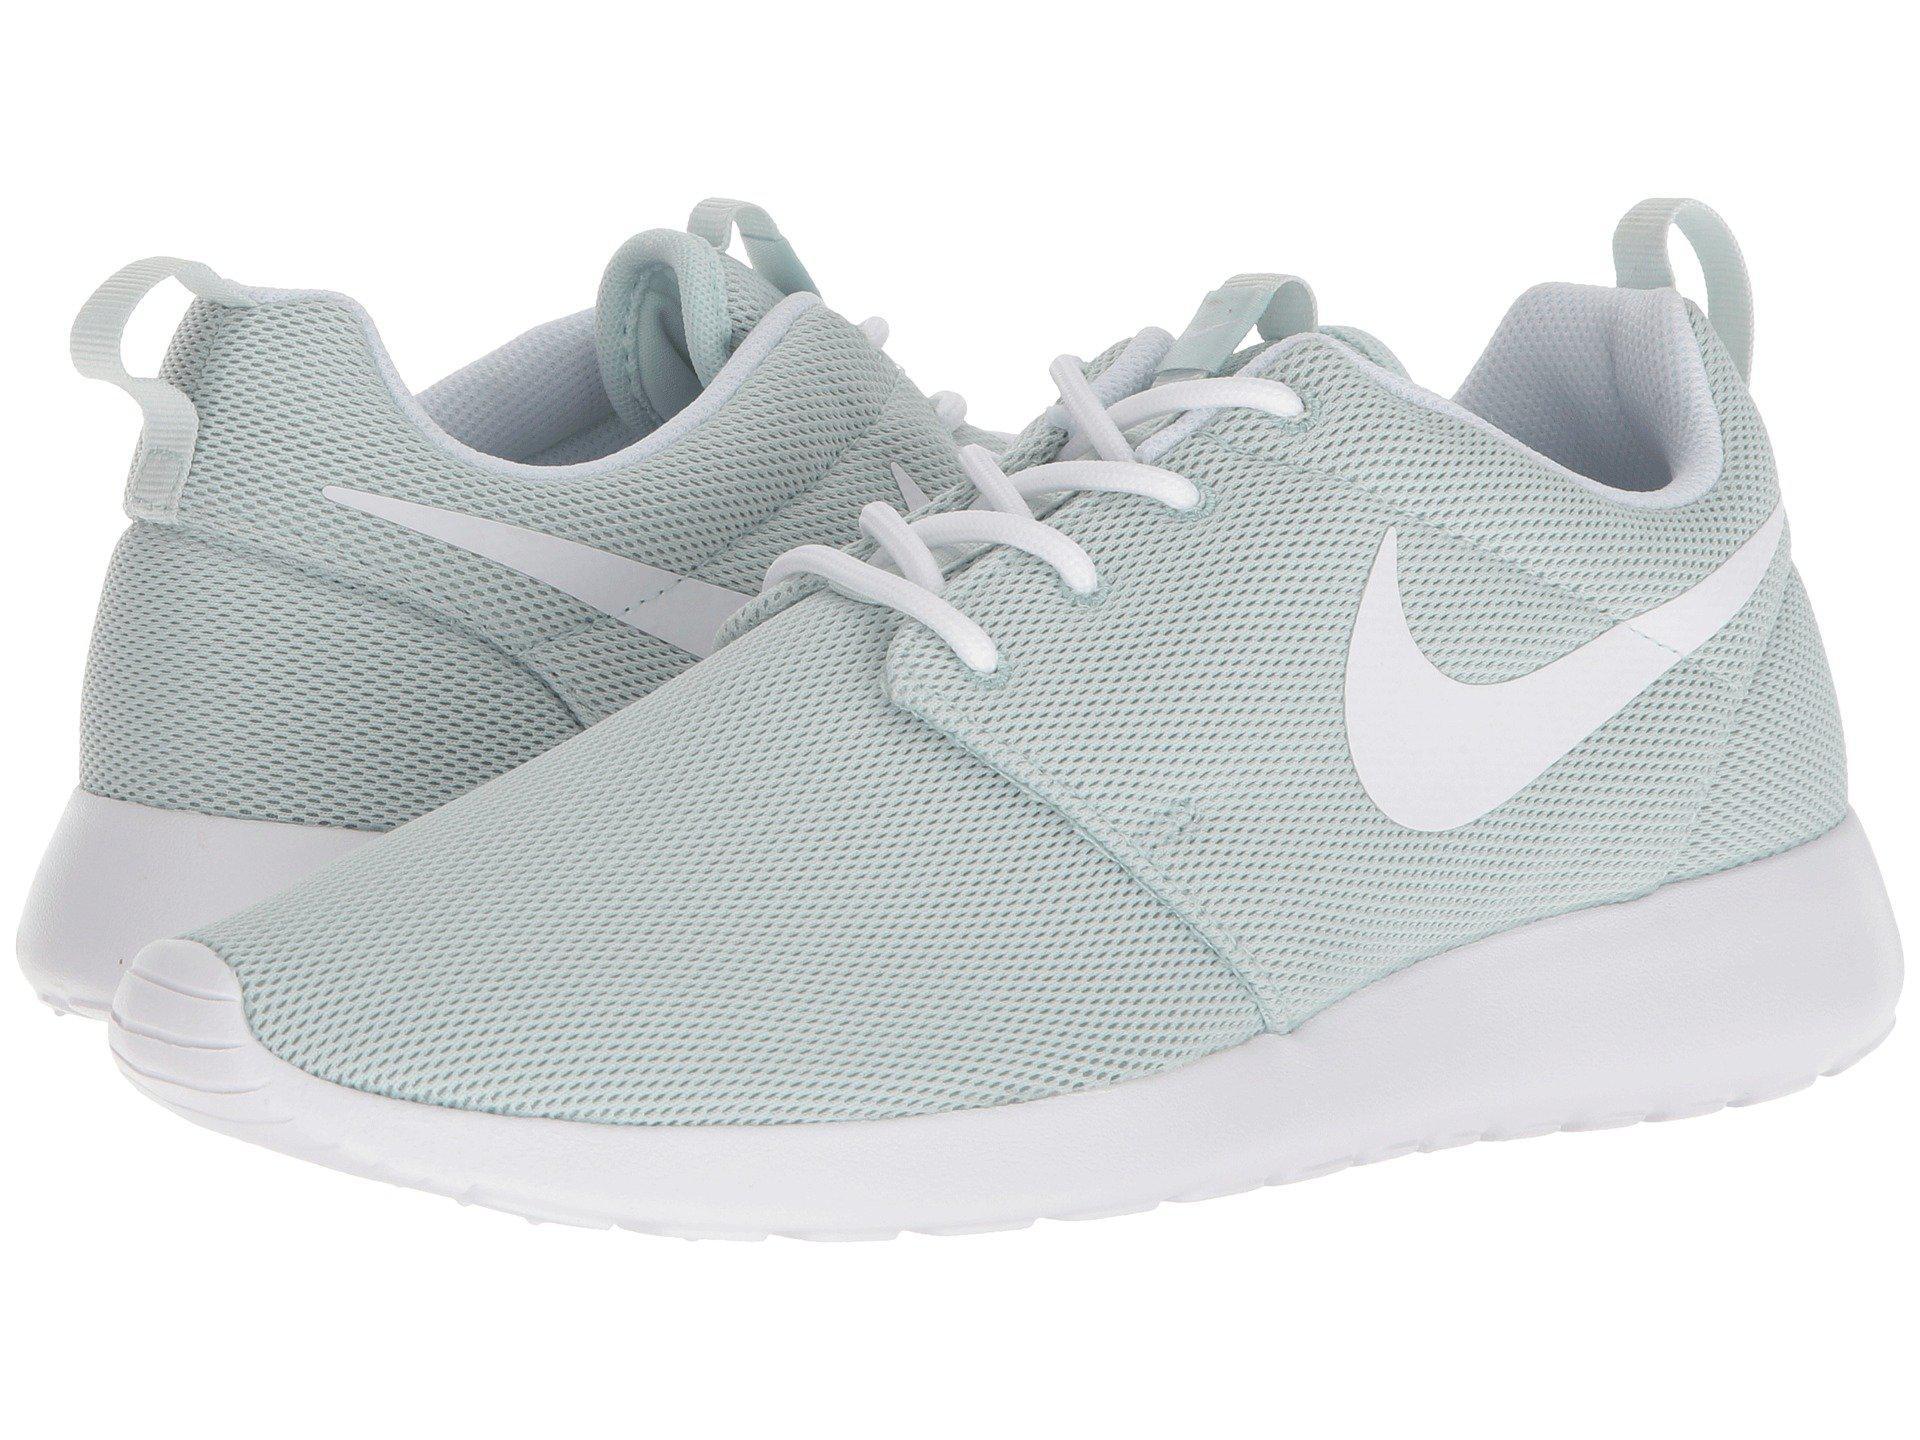 9a8de6c52ee95 nike-FiberglassWhite-Roshe-One-whitewhiteblack-Womens-Shoes.jpeg